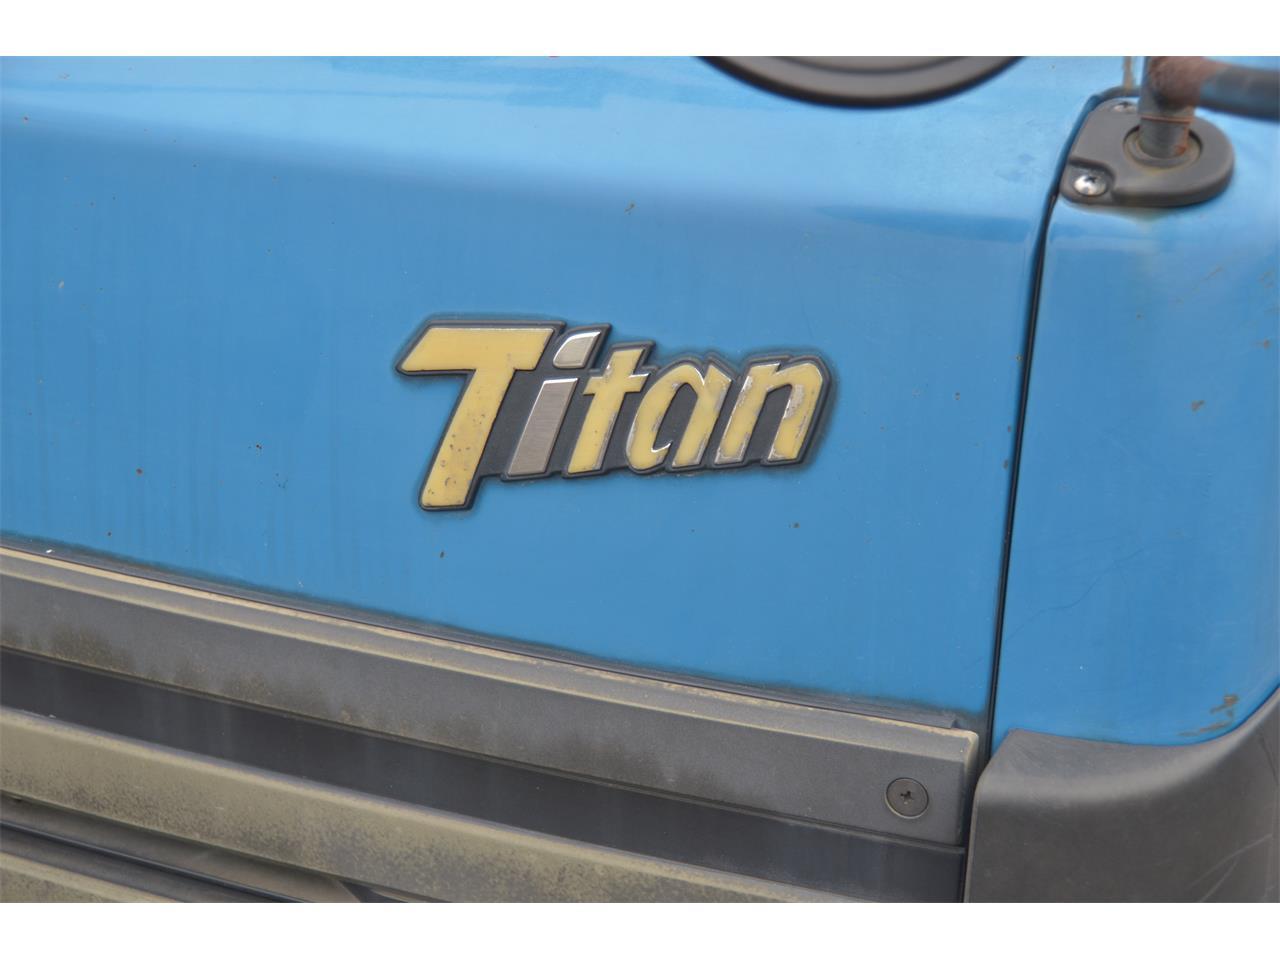 Large Picture of '86 Titan - L2SM